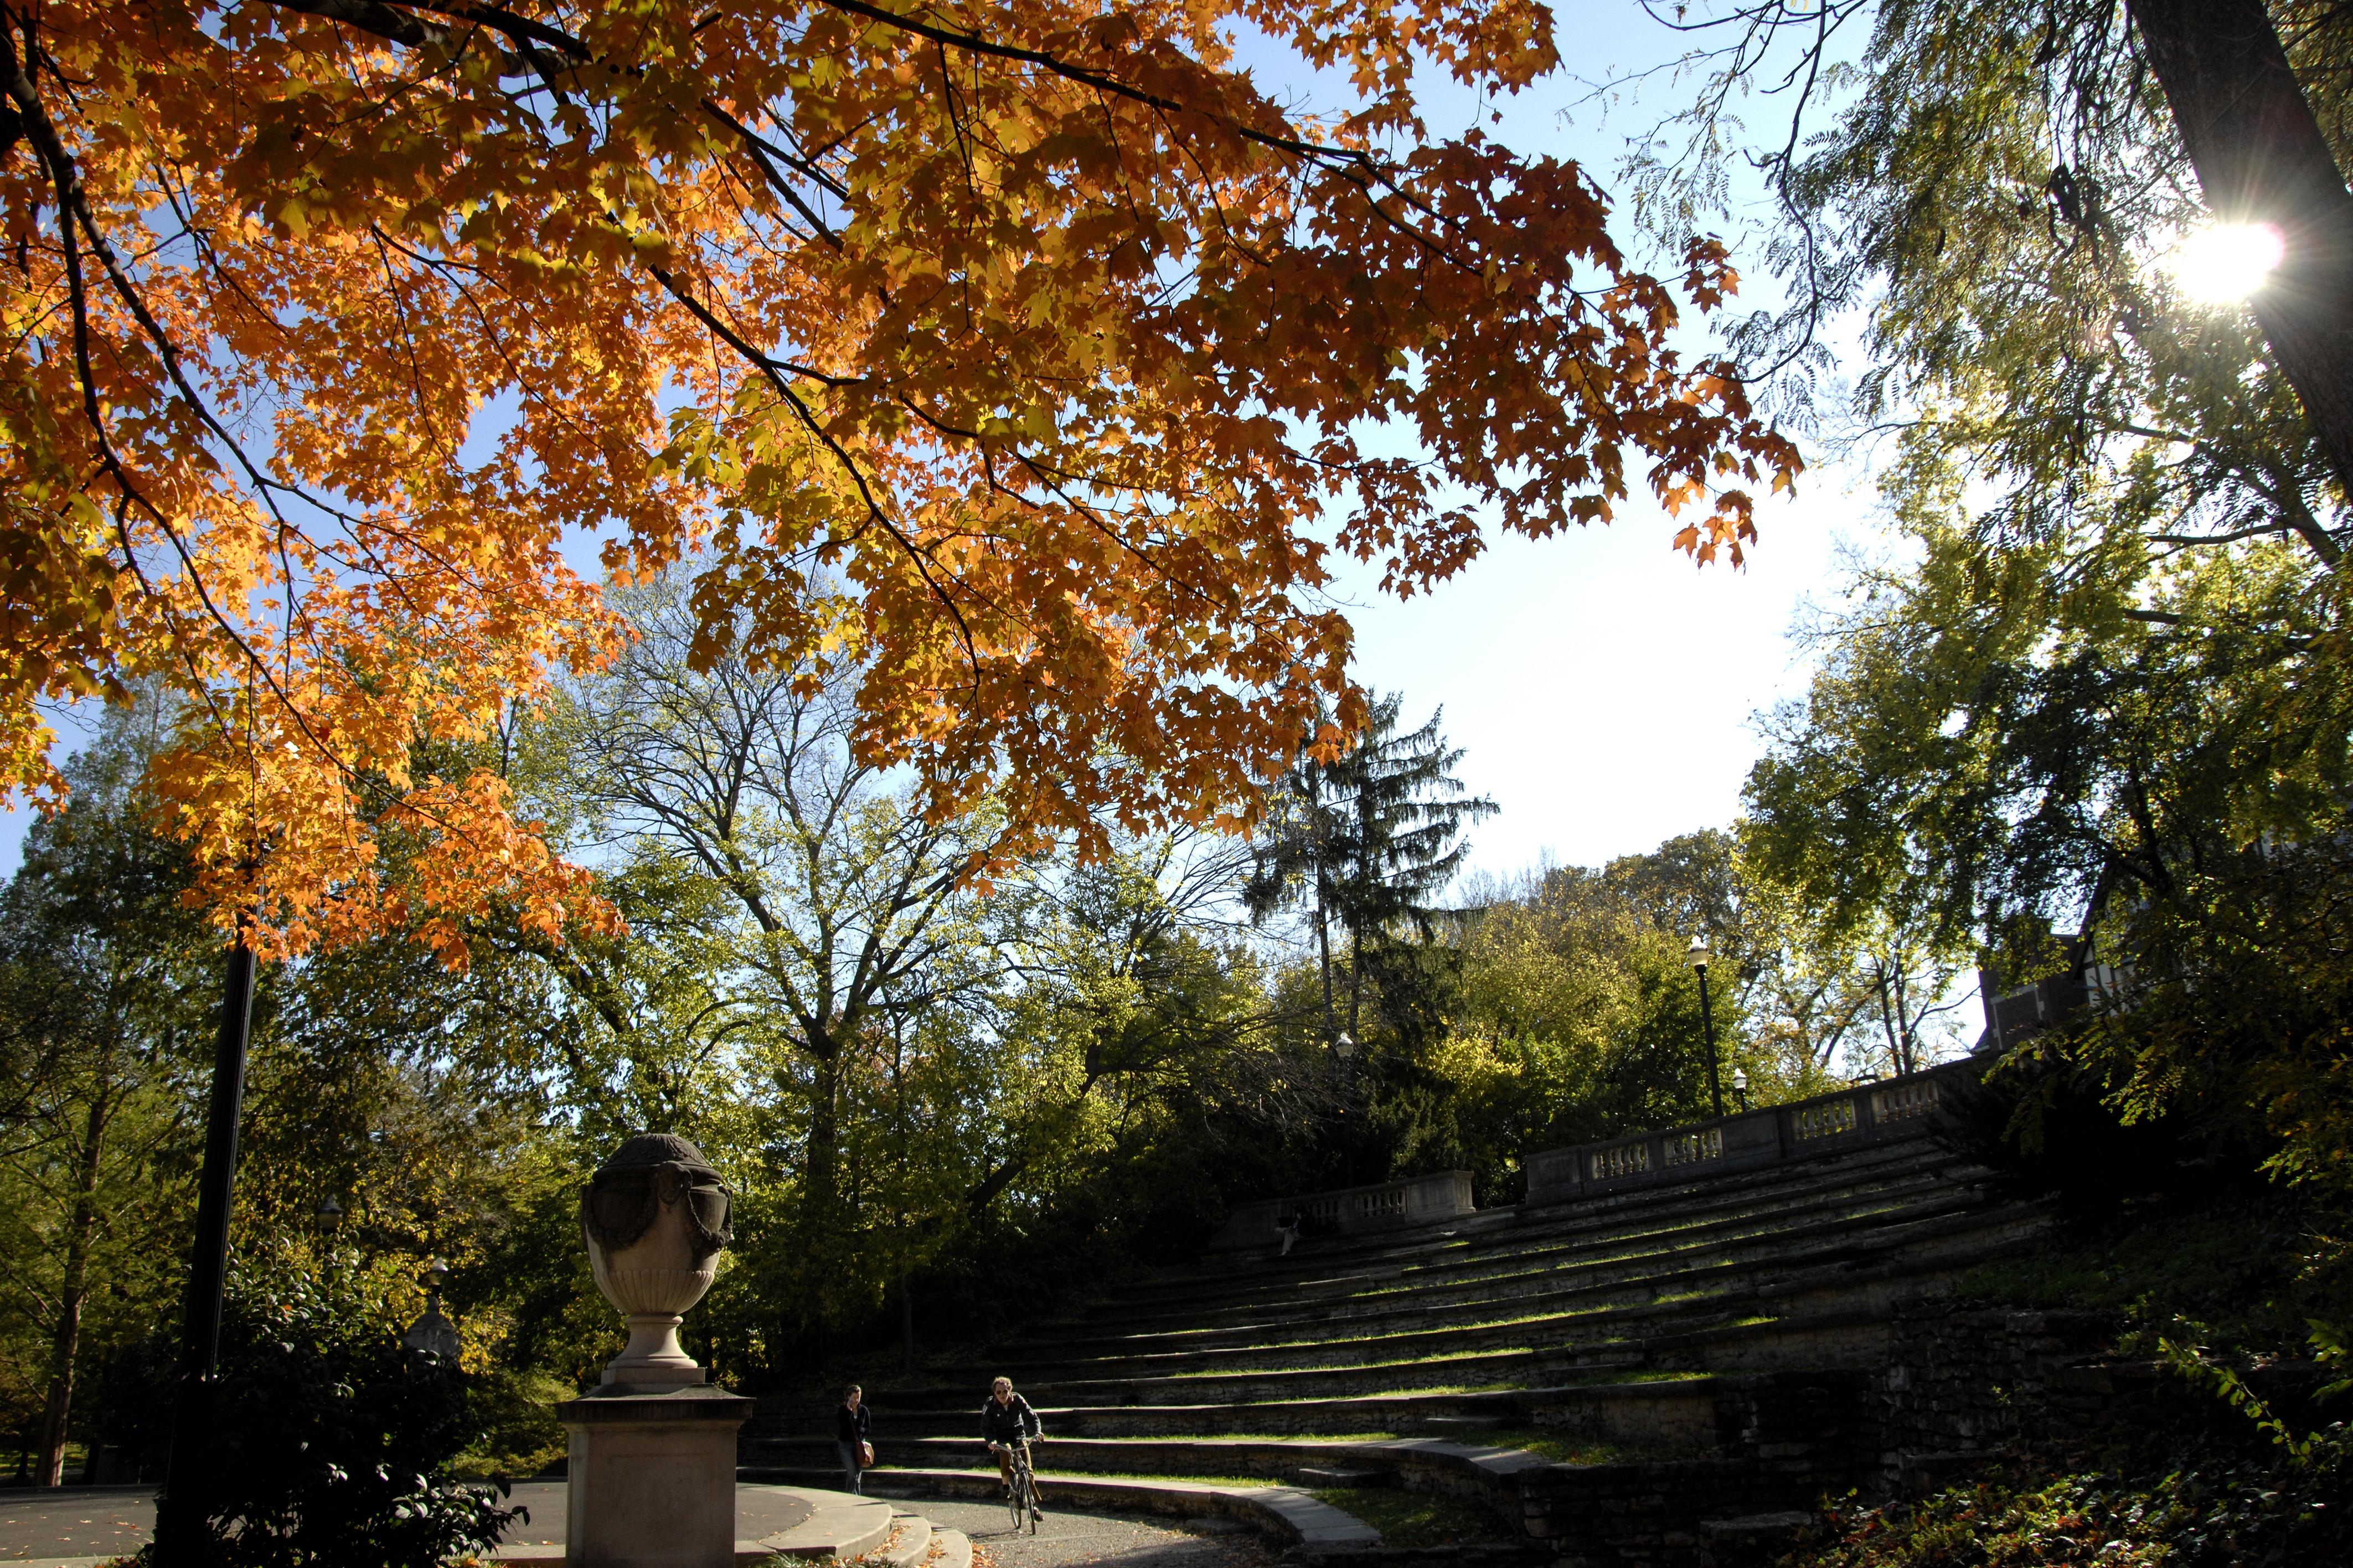 Ohio State outdoor arena in the autumn